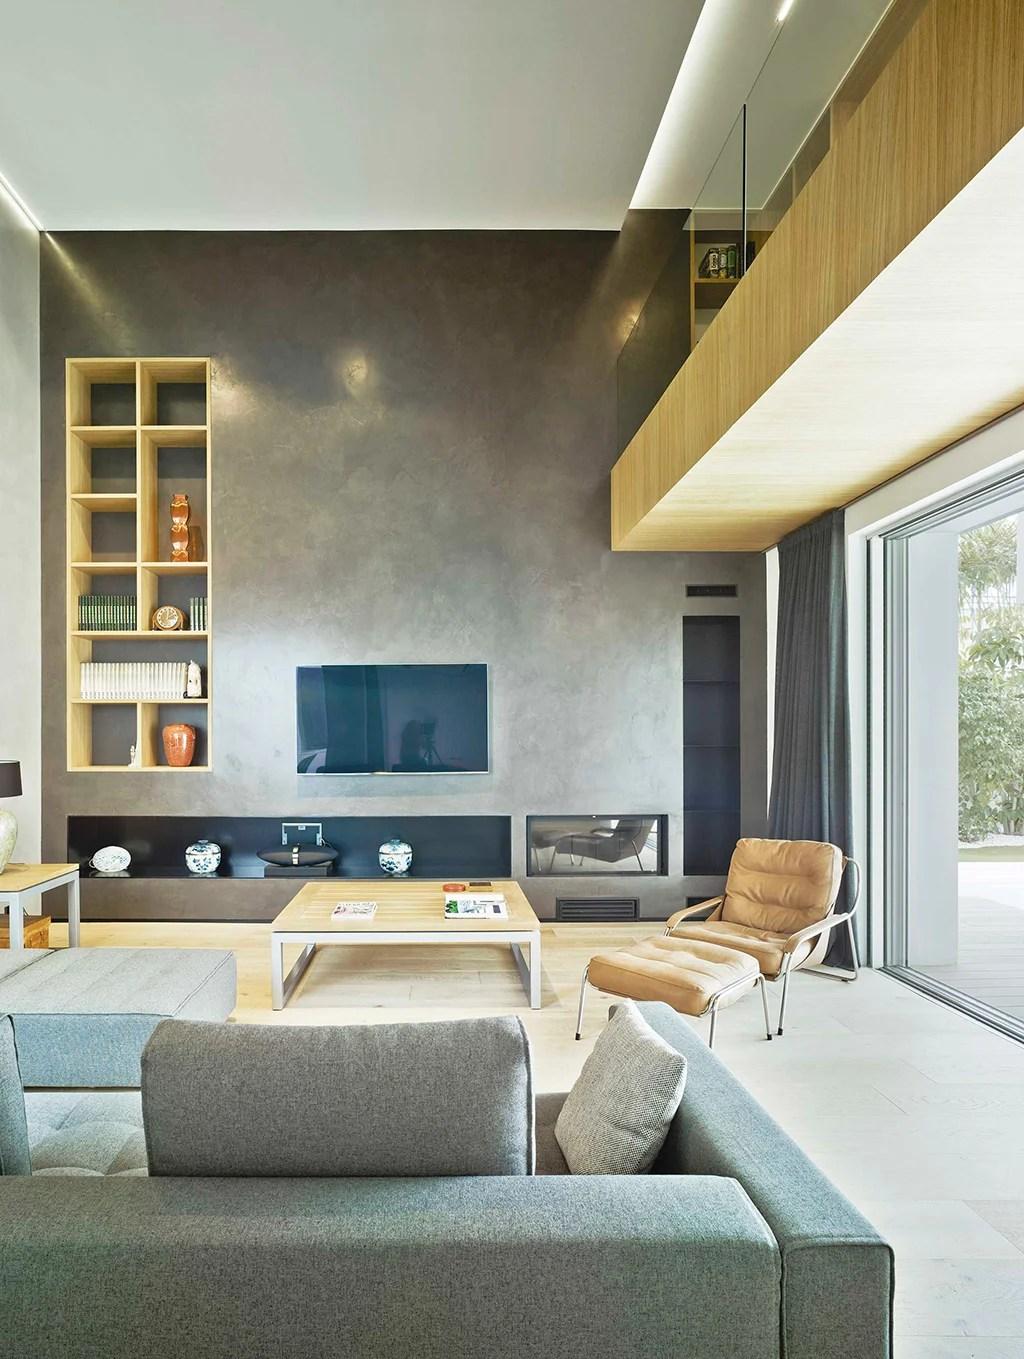 Unifamiliar minimalista. Sala de estar.